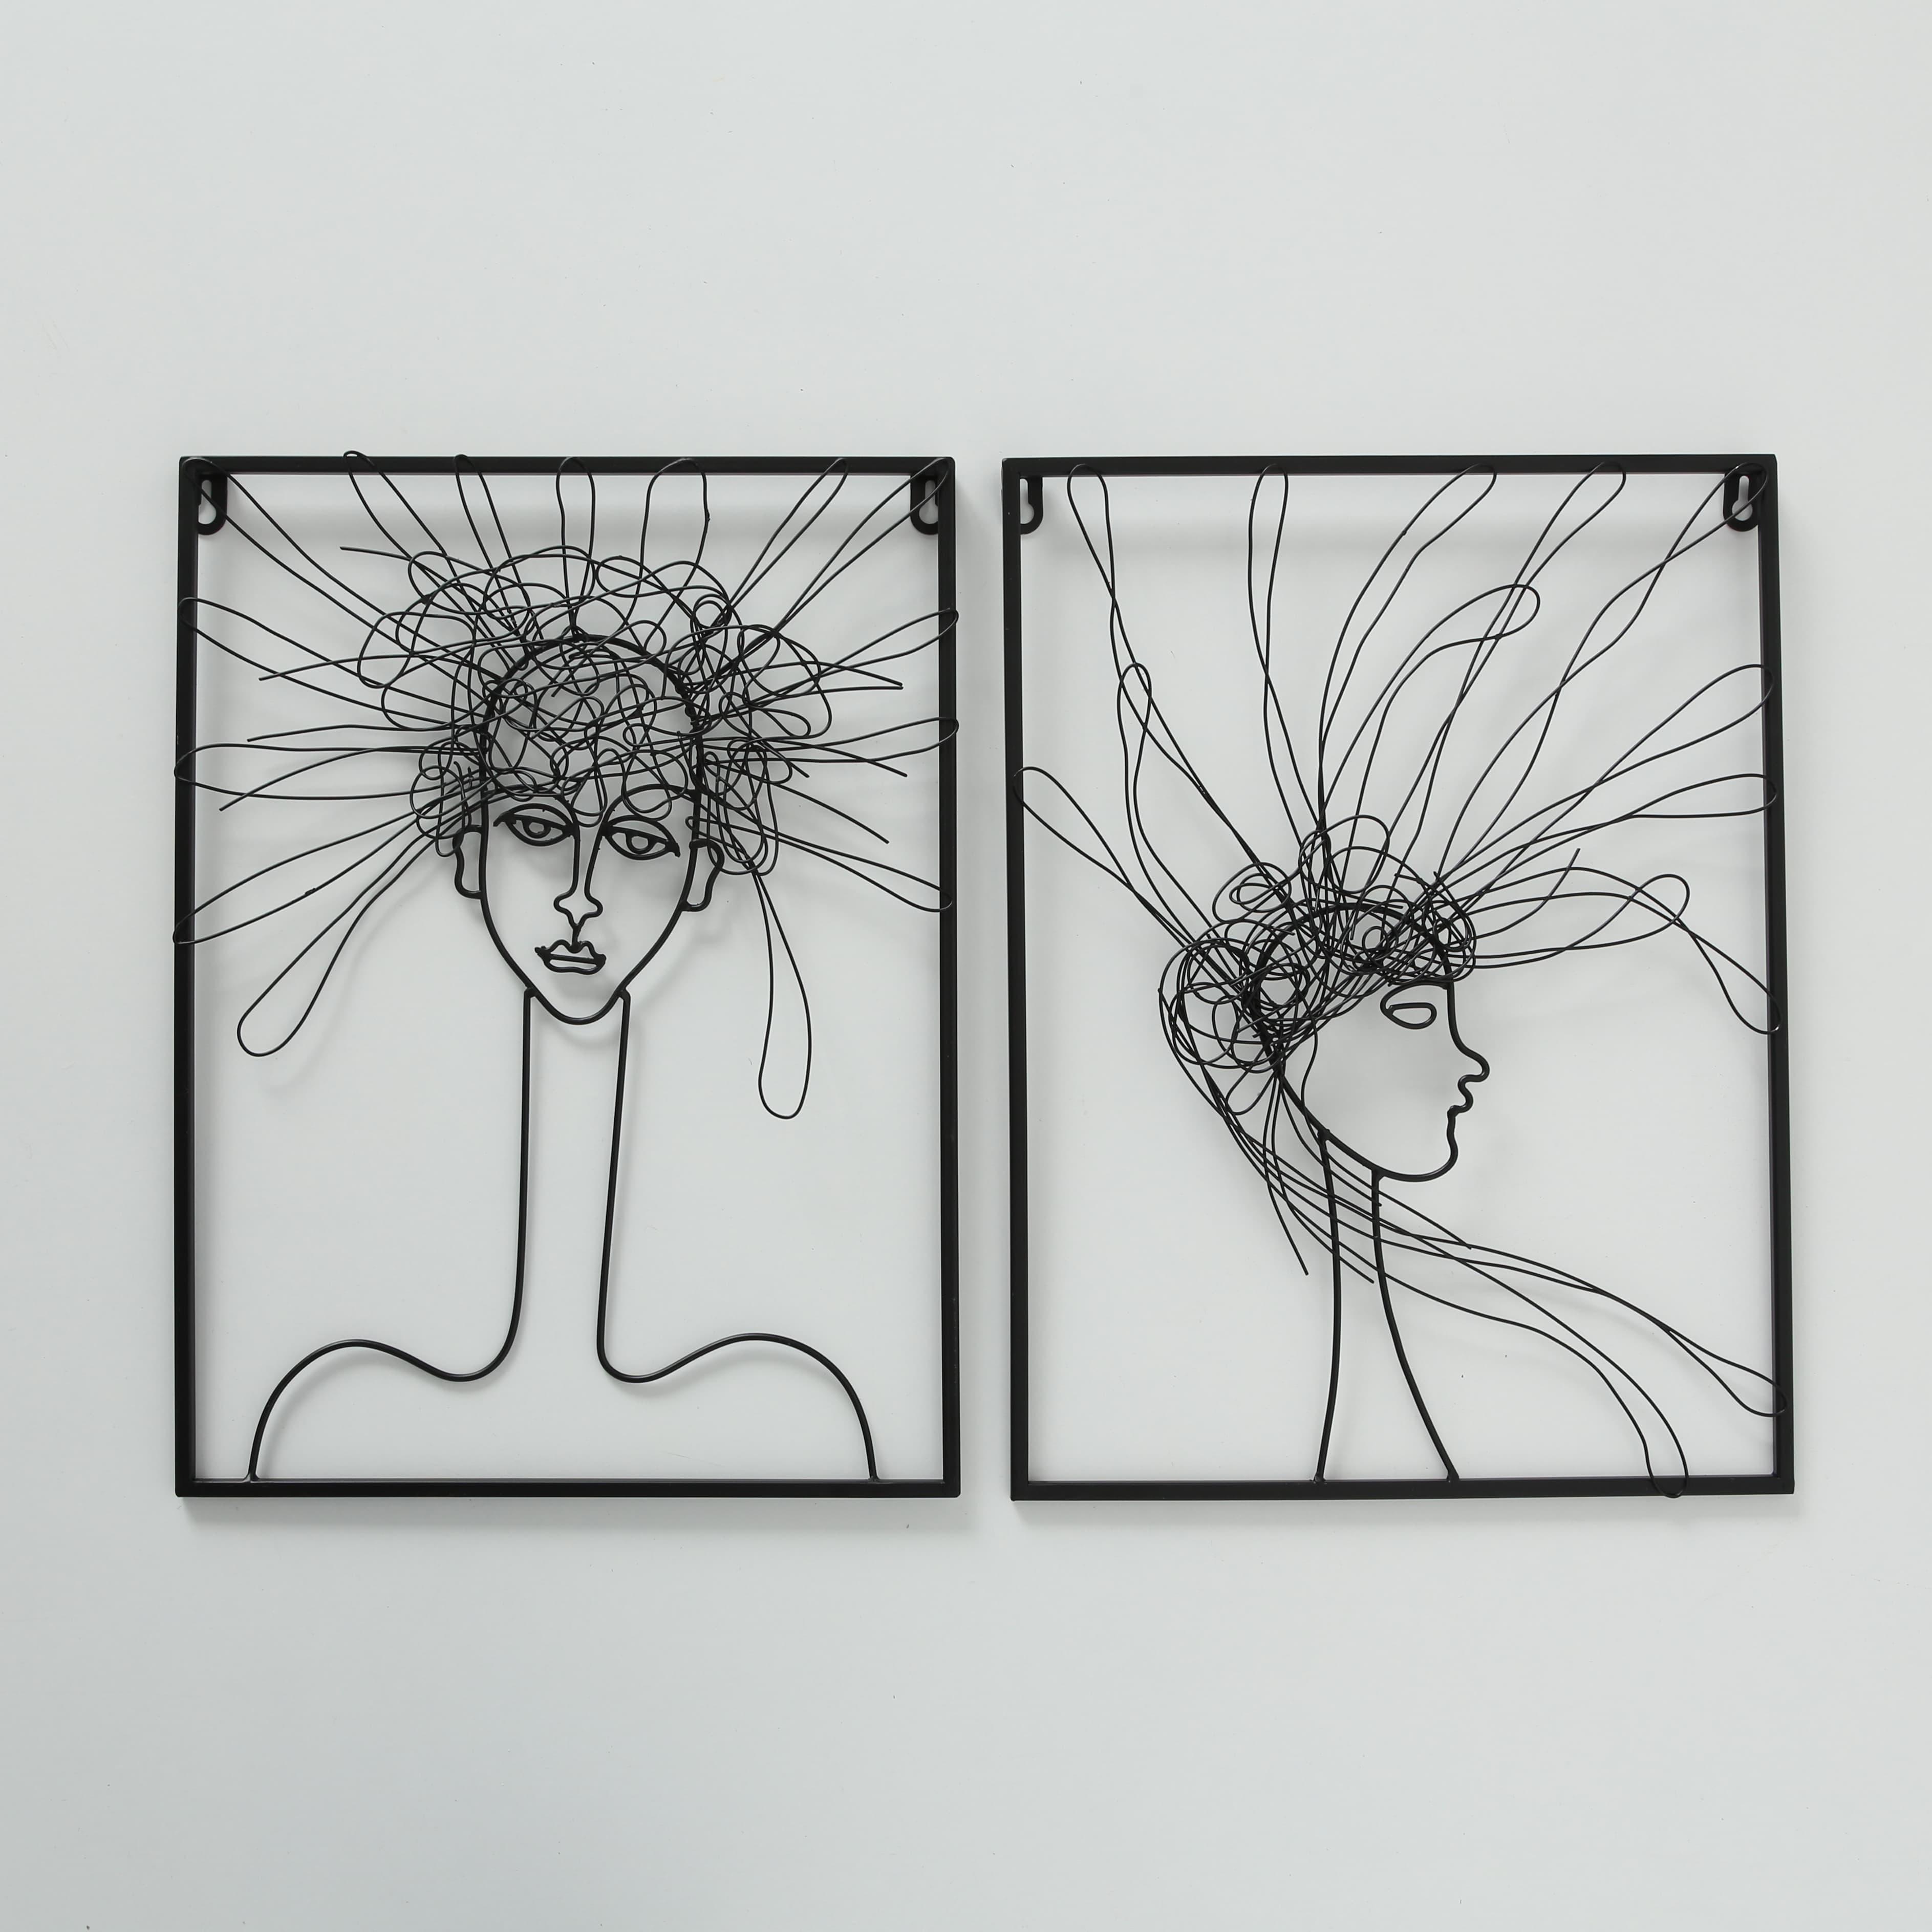 Decoratiune metalica de perete Hairy Negru, Modele Asortate, l30xA1xH40 cm poza